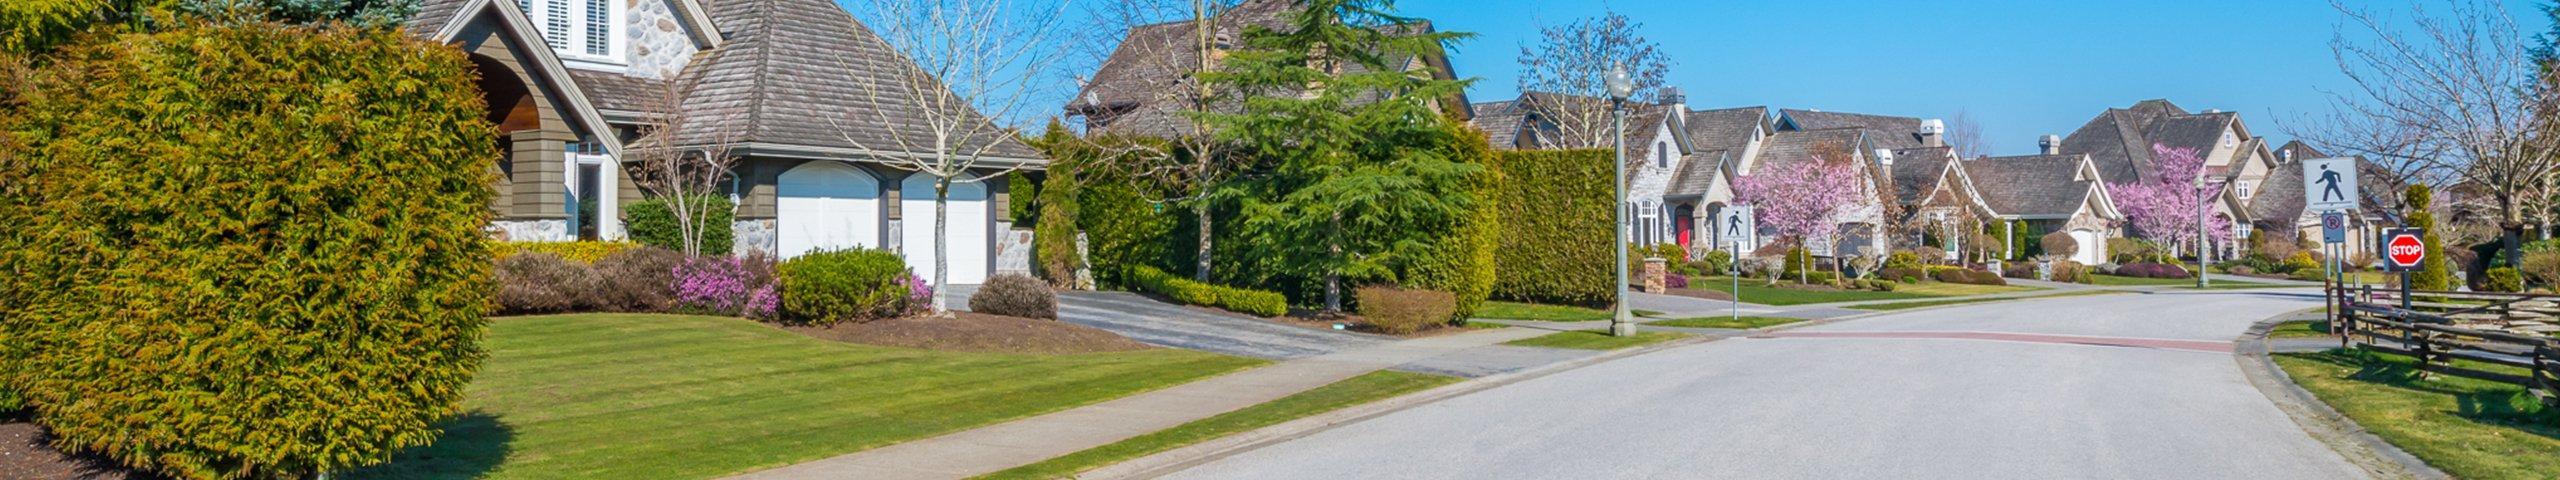 a suburban neighborhood street